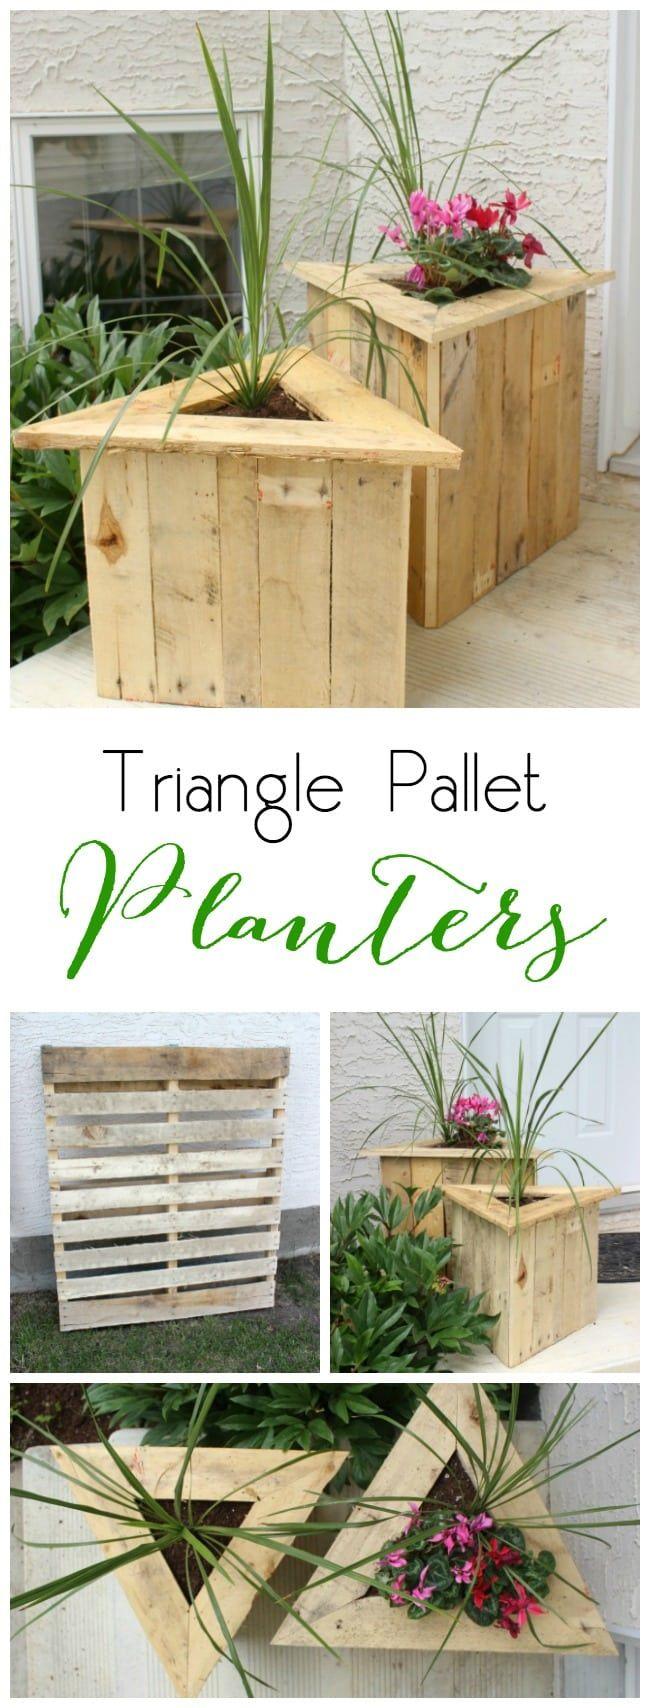 Build Your Own Triangle Pallet Planters Diy Pallet 400 x 300